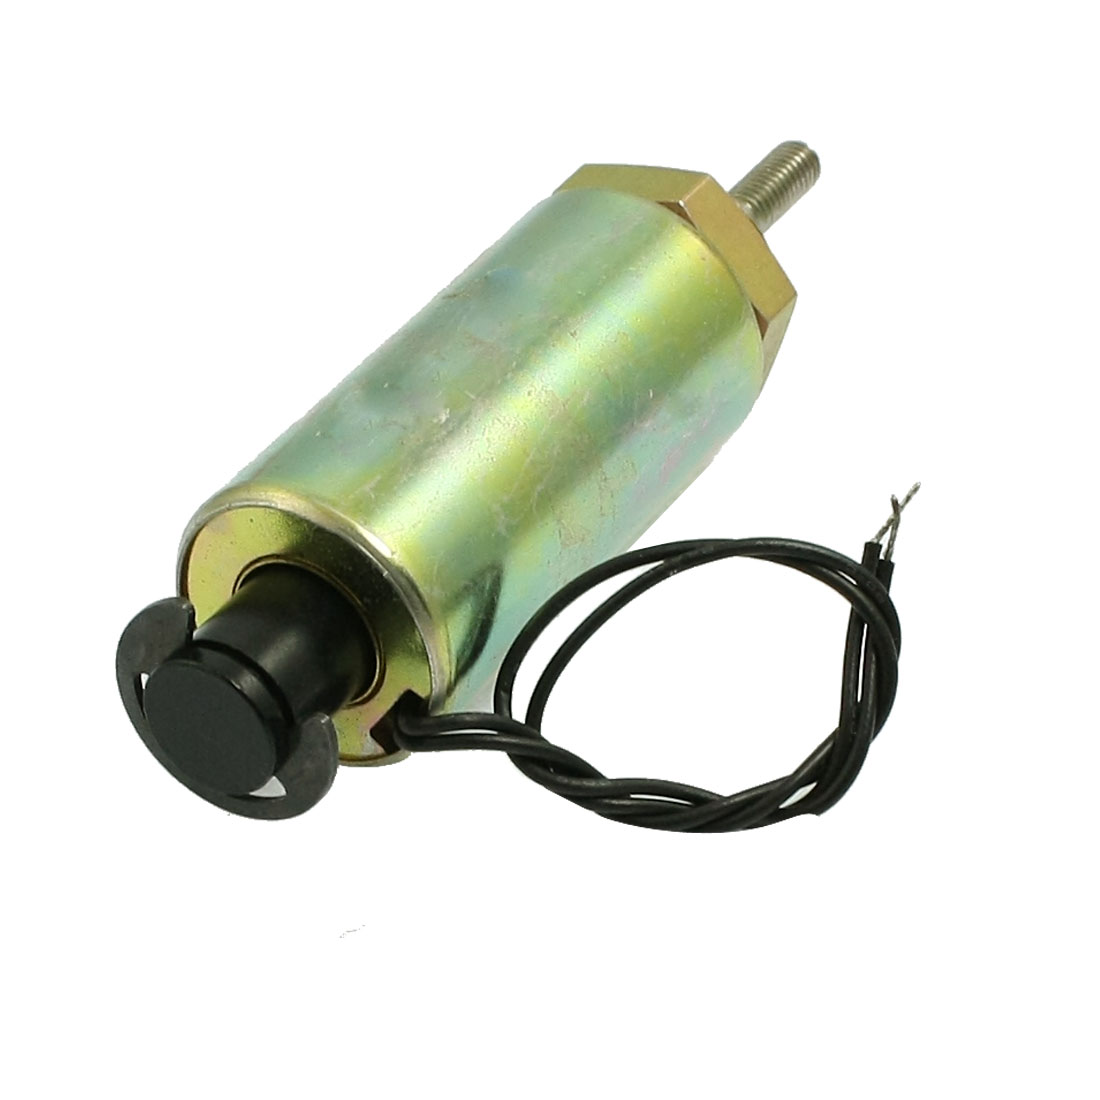 18mm Stroke 0.3N Cylindrical Tubular Pull Type Solenoid DC 24V 1.2A